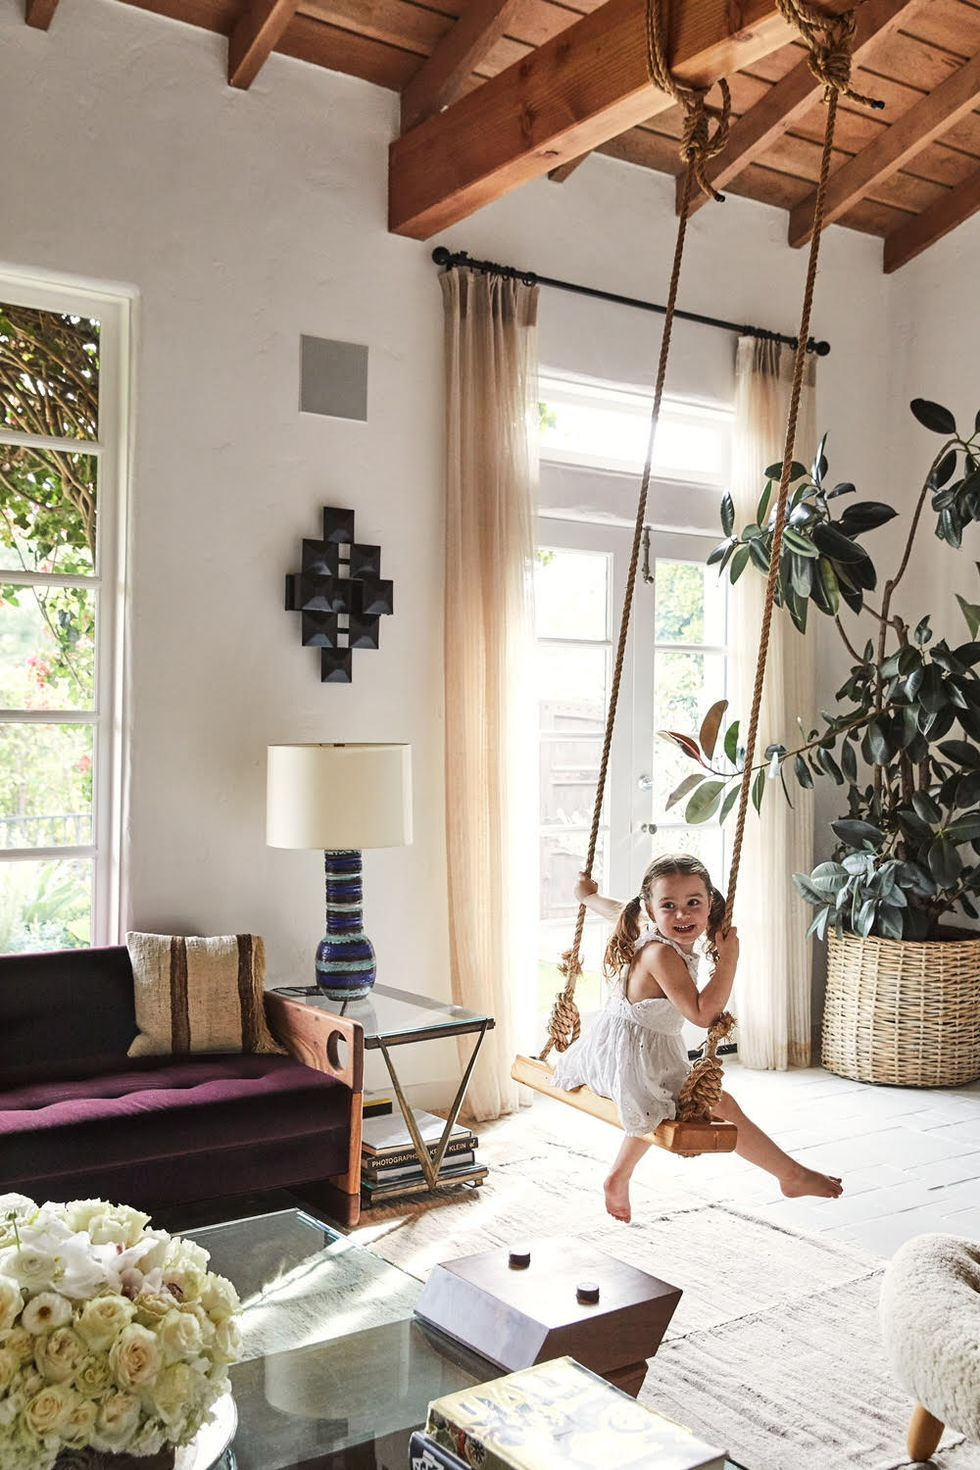 Kim kardashianus stylist simone harouche is now an interior designer